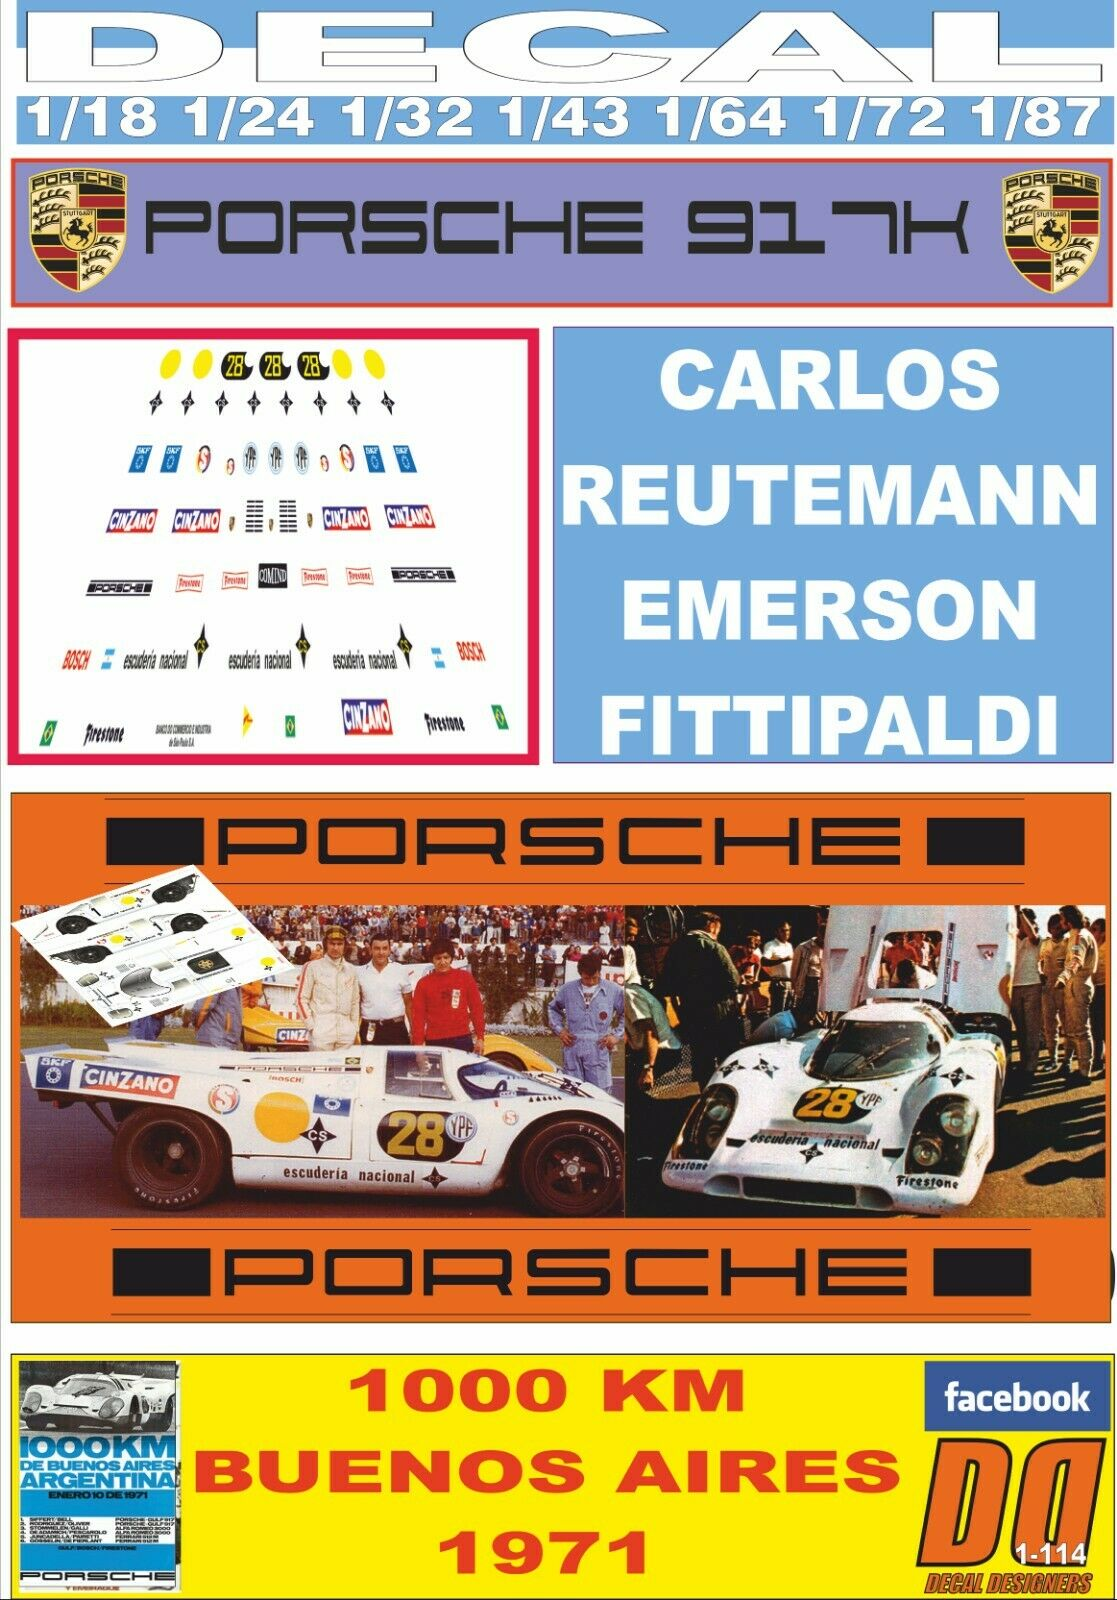 DECAL PORSCHE 917K REUTMANN -FITTIPALALDI 1000 KM BUENOS AIRES 1971 (03)